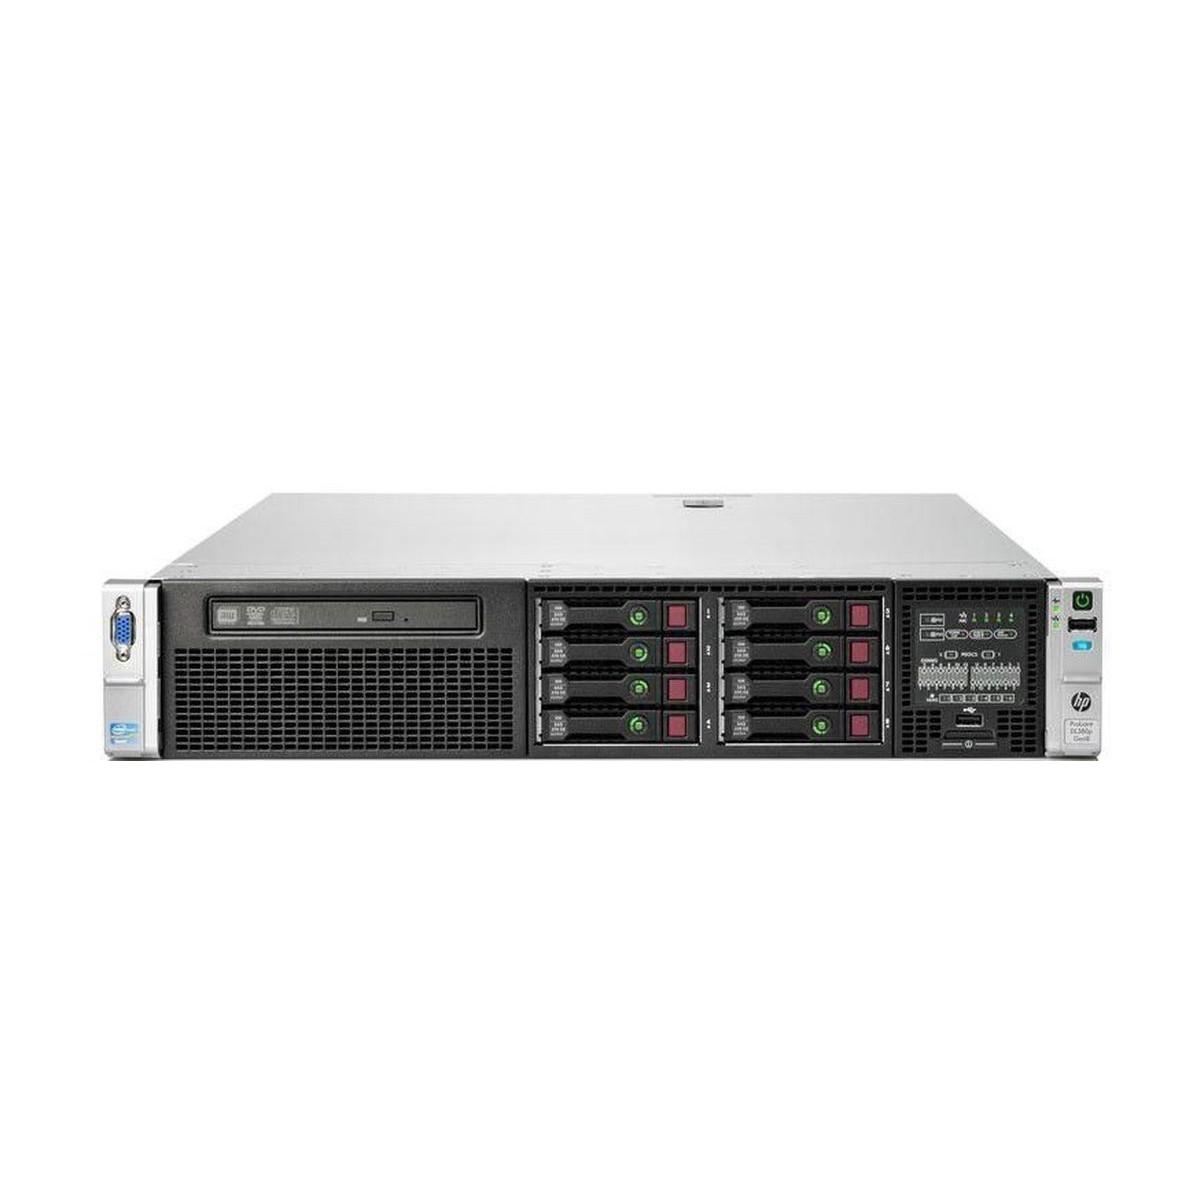 HP DL380p G8 E5-2667 v2 8CORE 64GB 4x600GB SAS